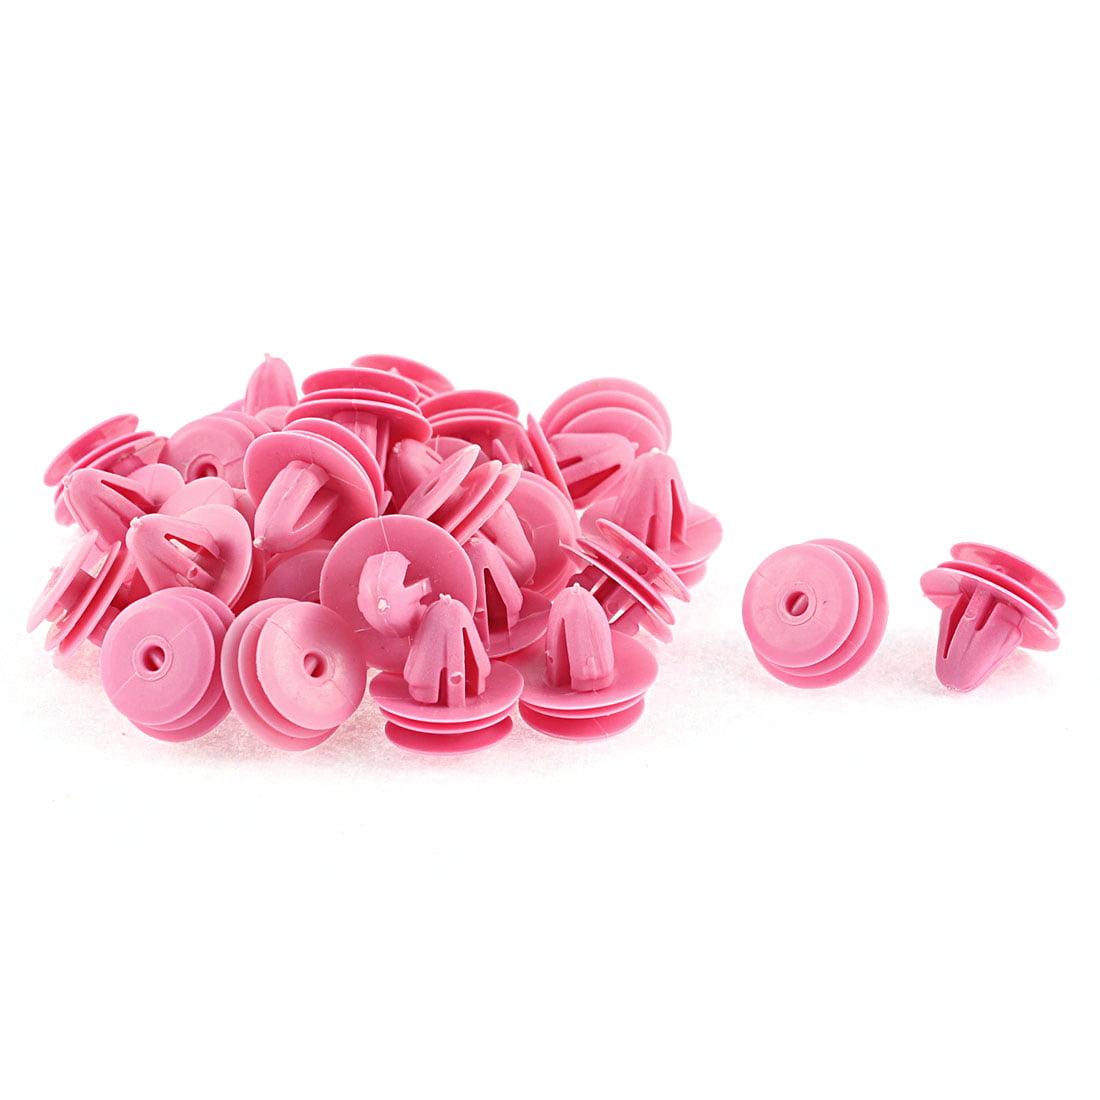 Unique Bargains 30 Pcs 10mm x 7.5mm Hole Fuchsia Plastic Rivets Fastener for  Elantra